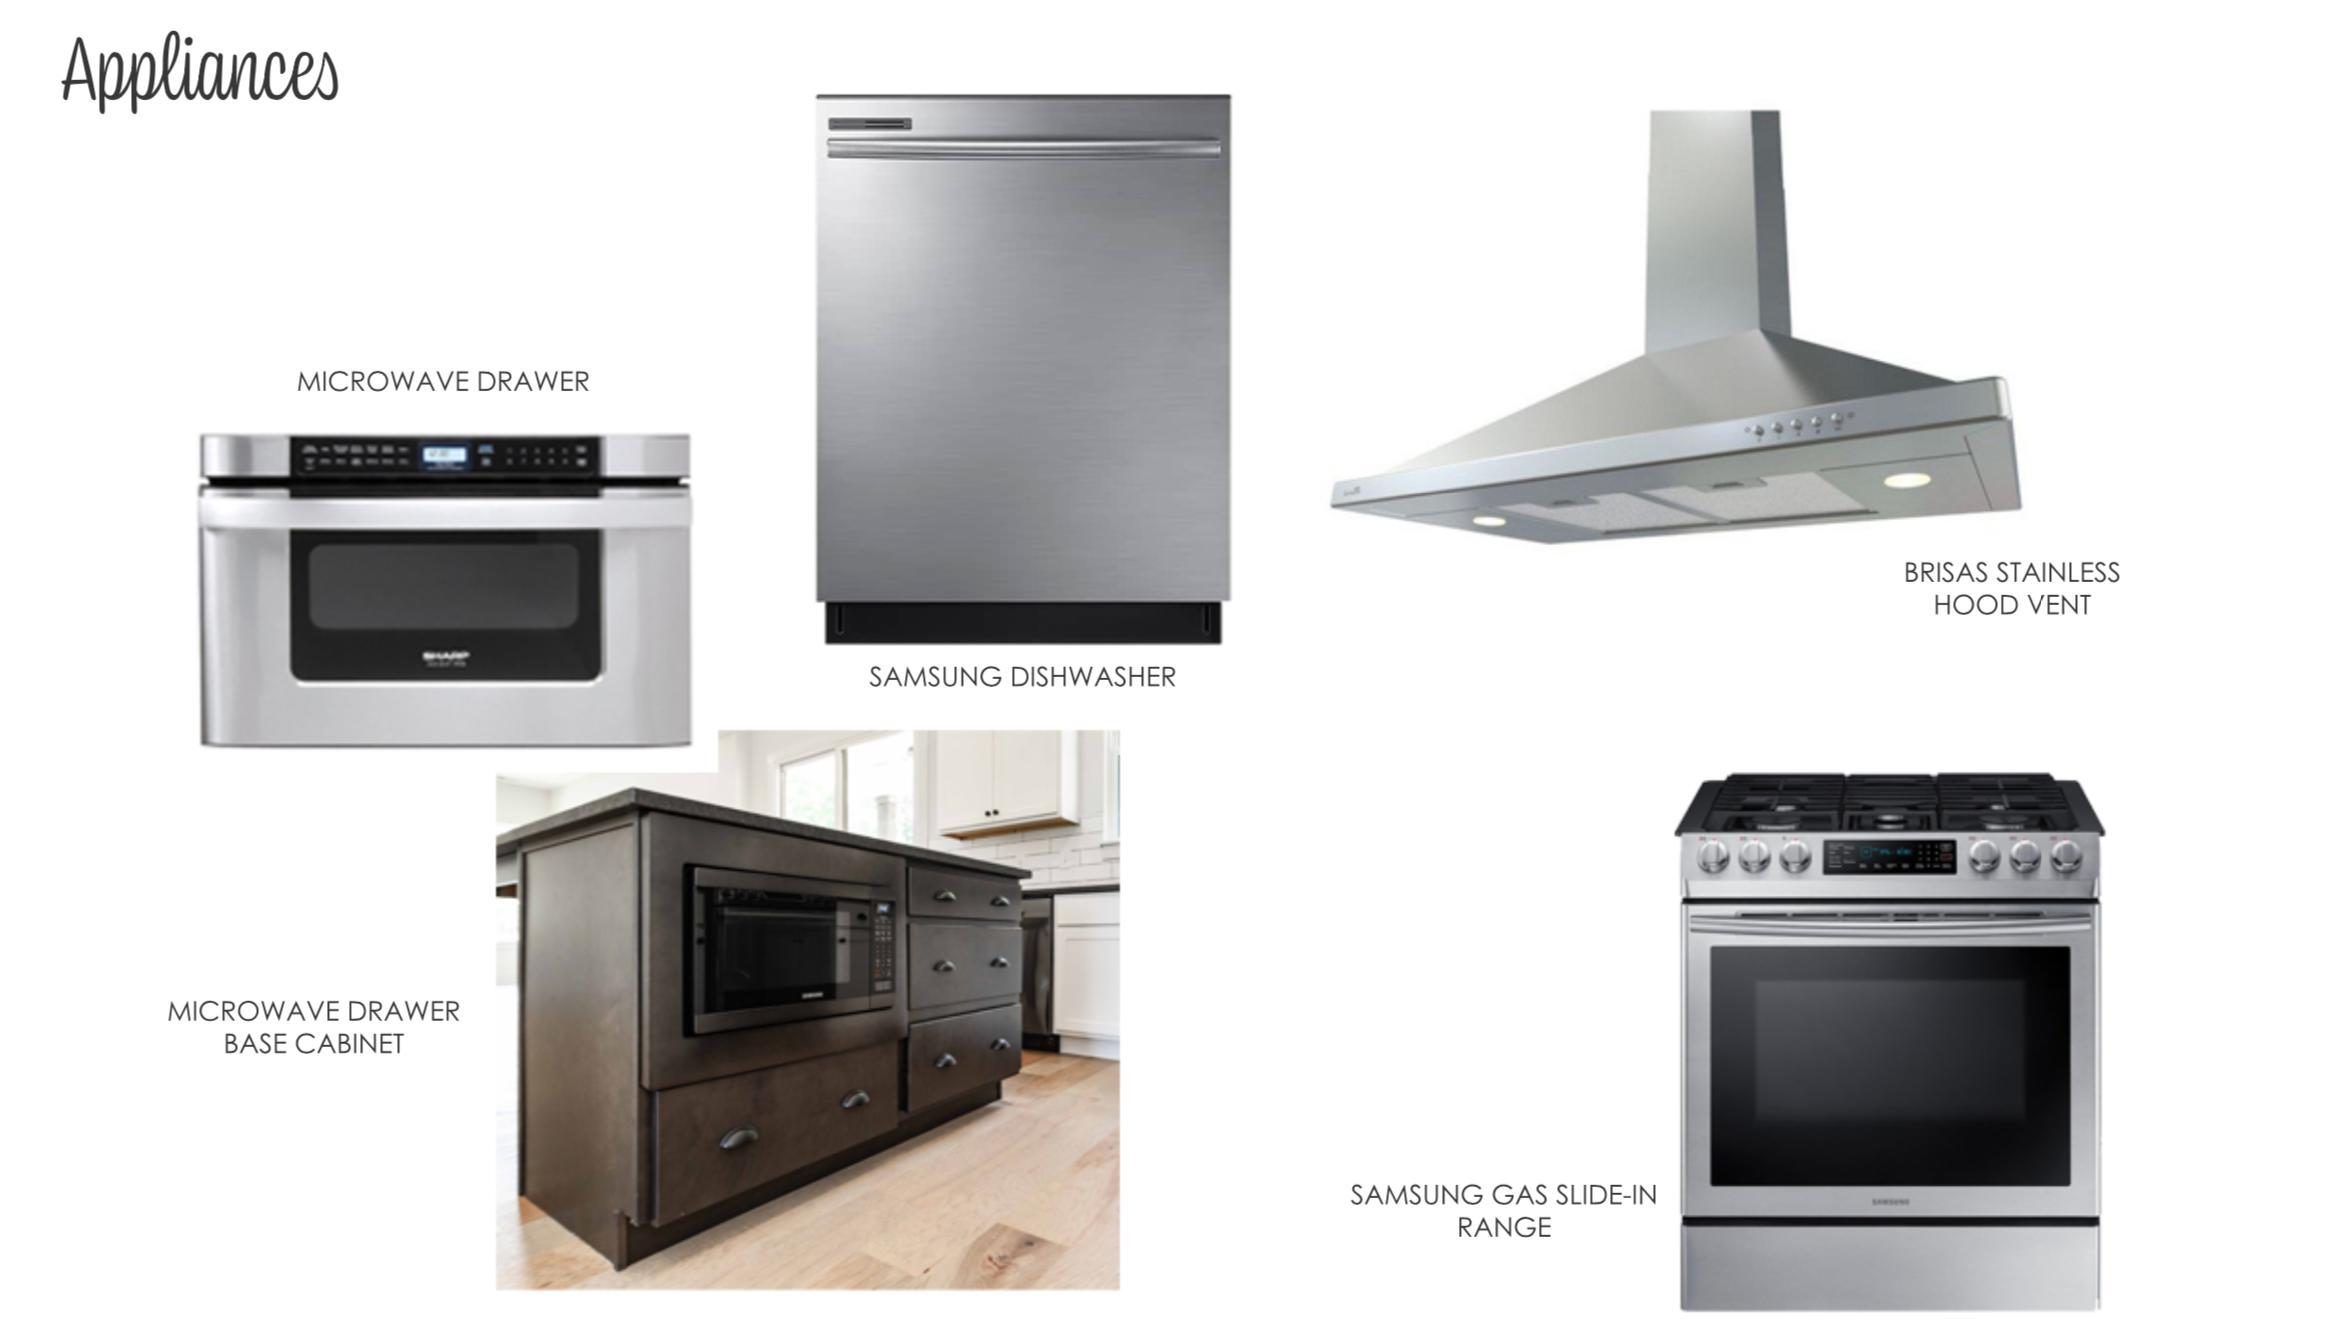 Appliances SB1